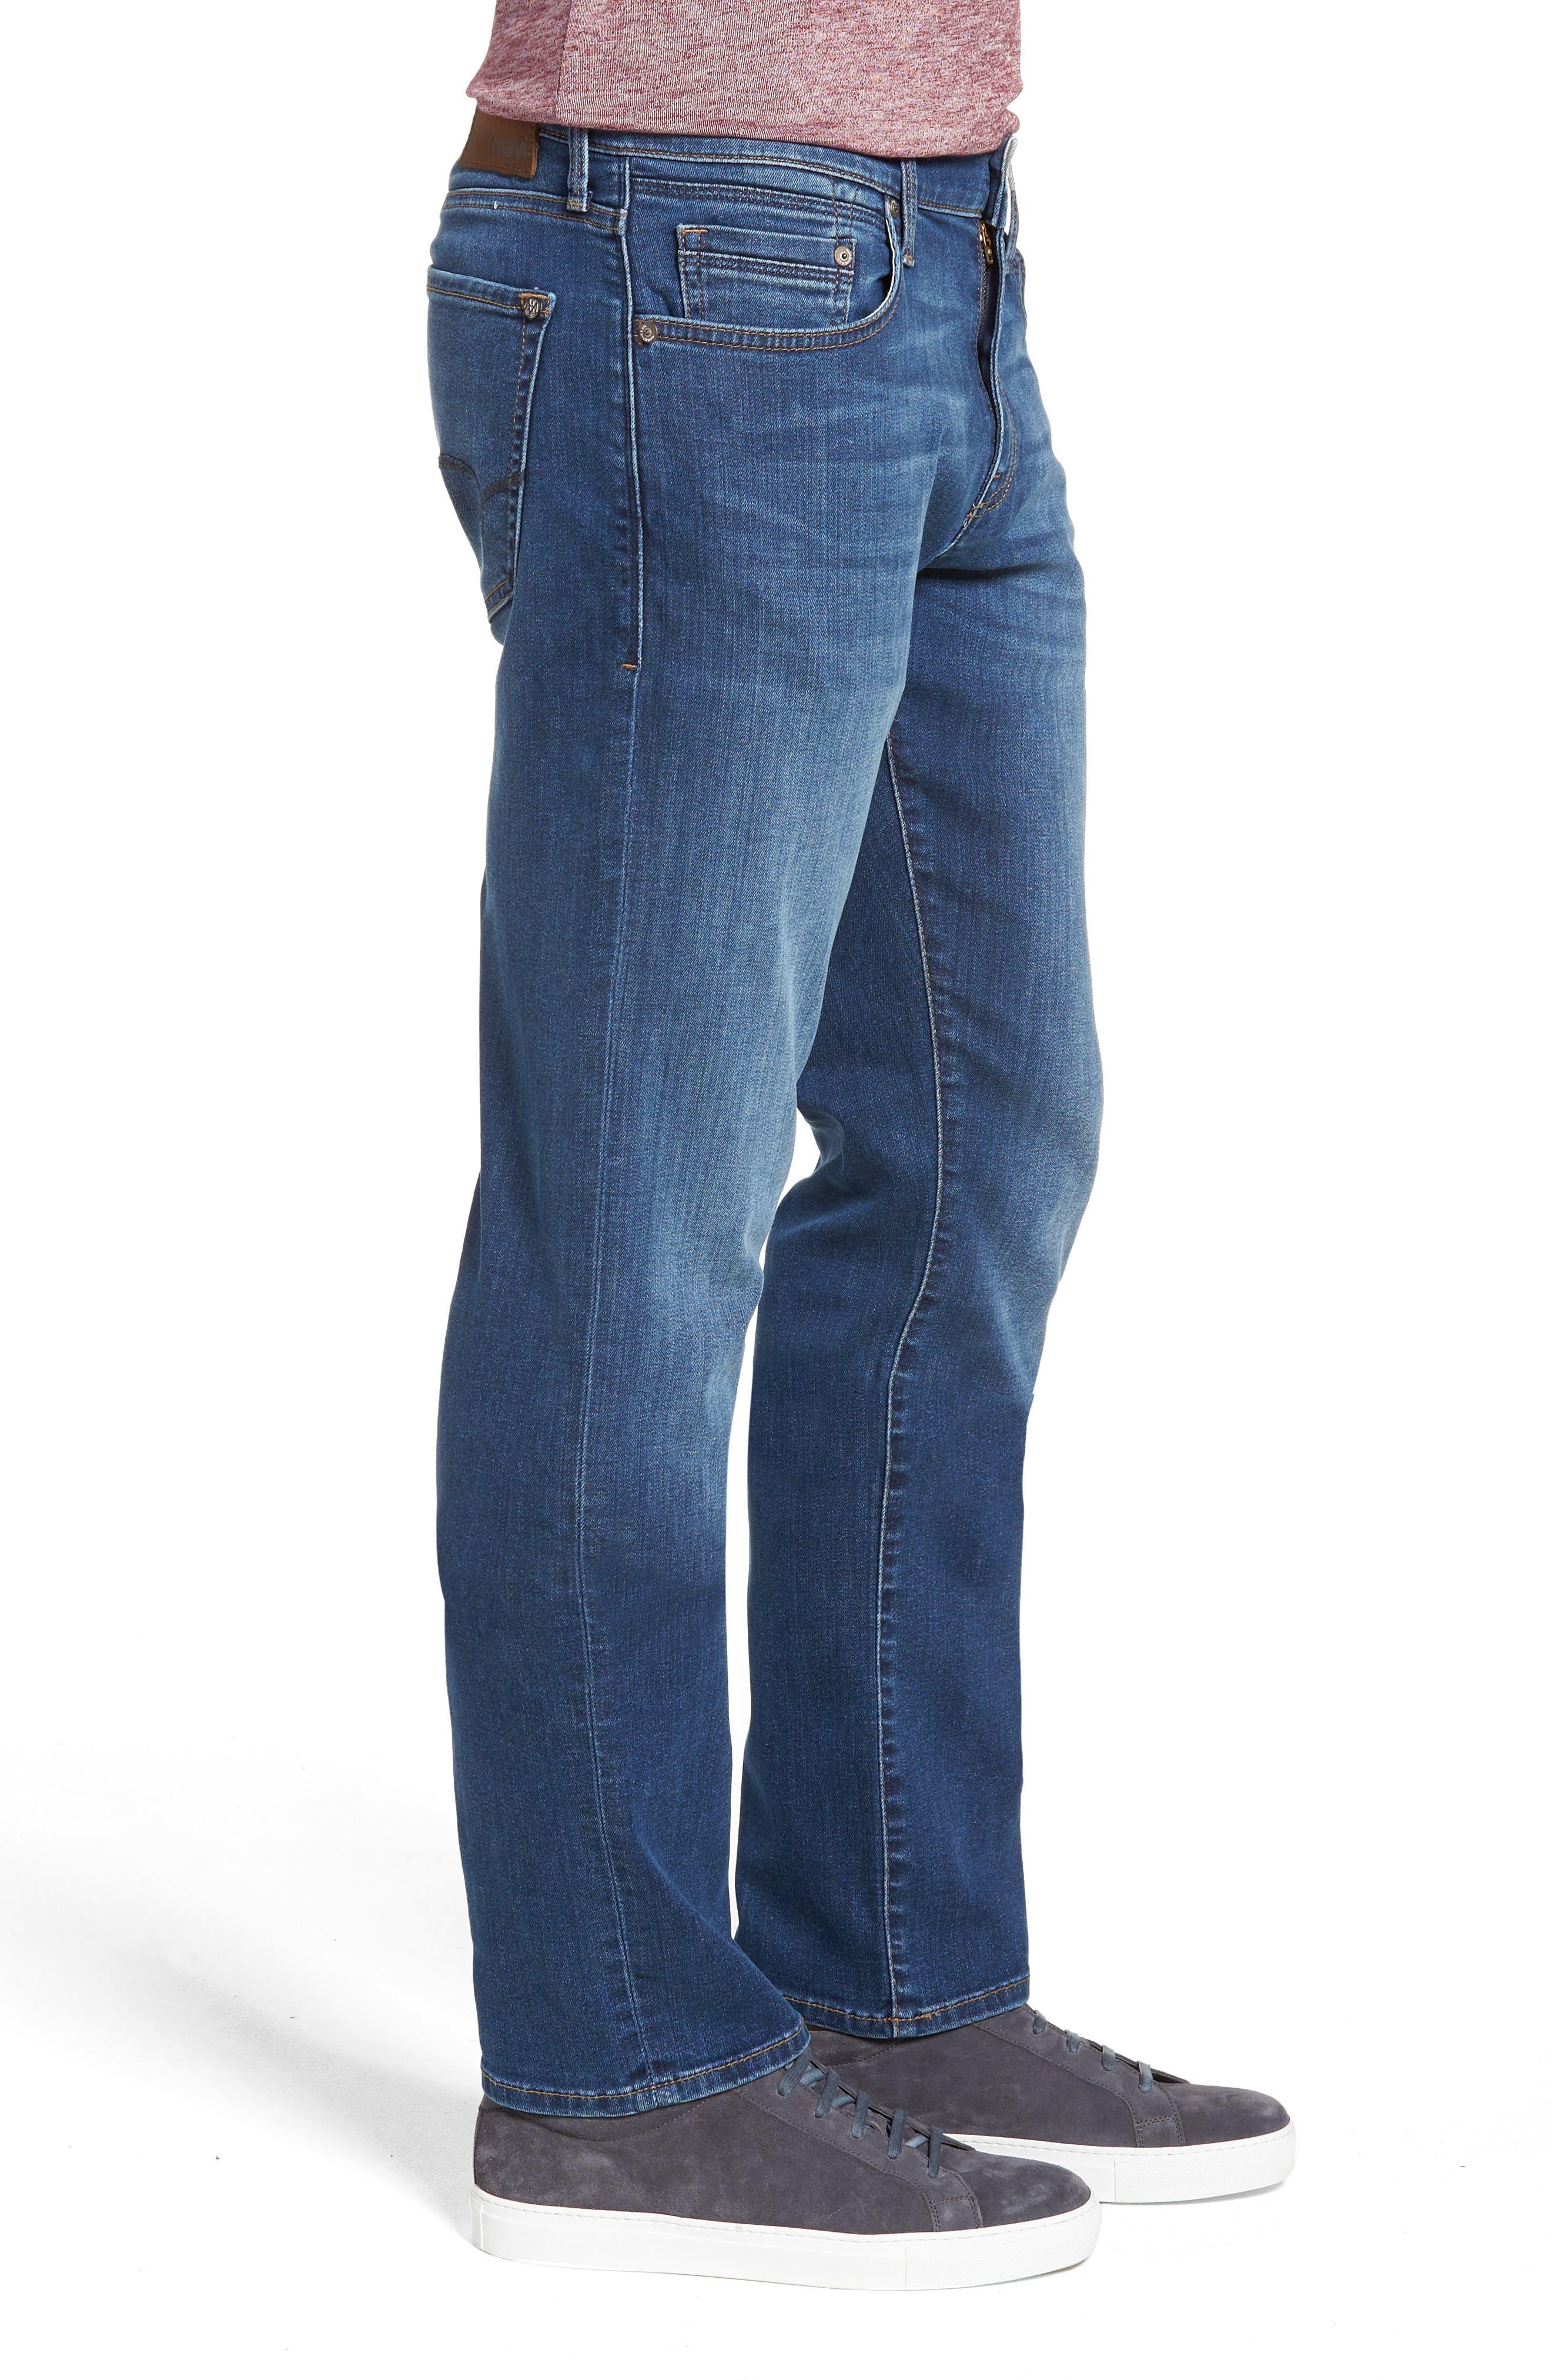 MAVI JEANS, Zach Straight Leg Jeans, Alternate thumbnail 4, color, DARK USED CAPITOL HILL